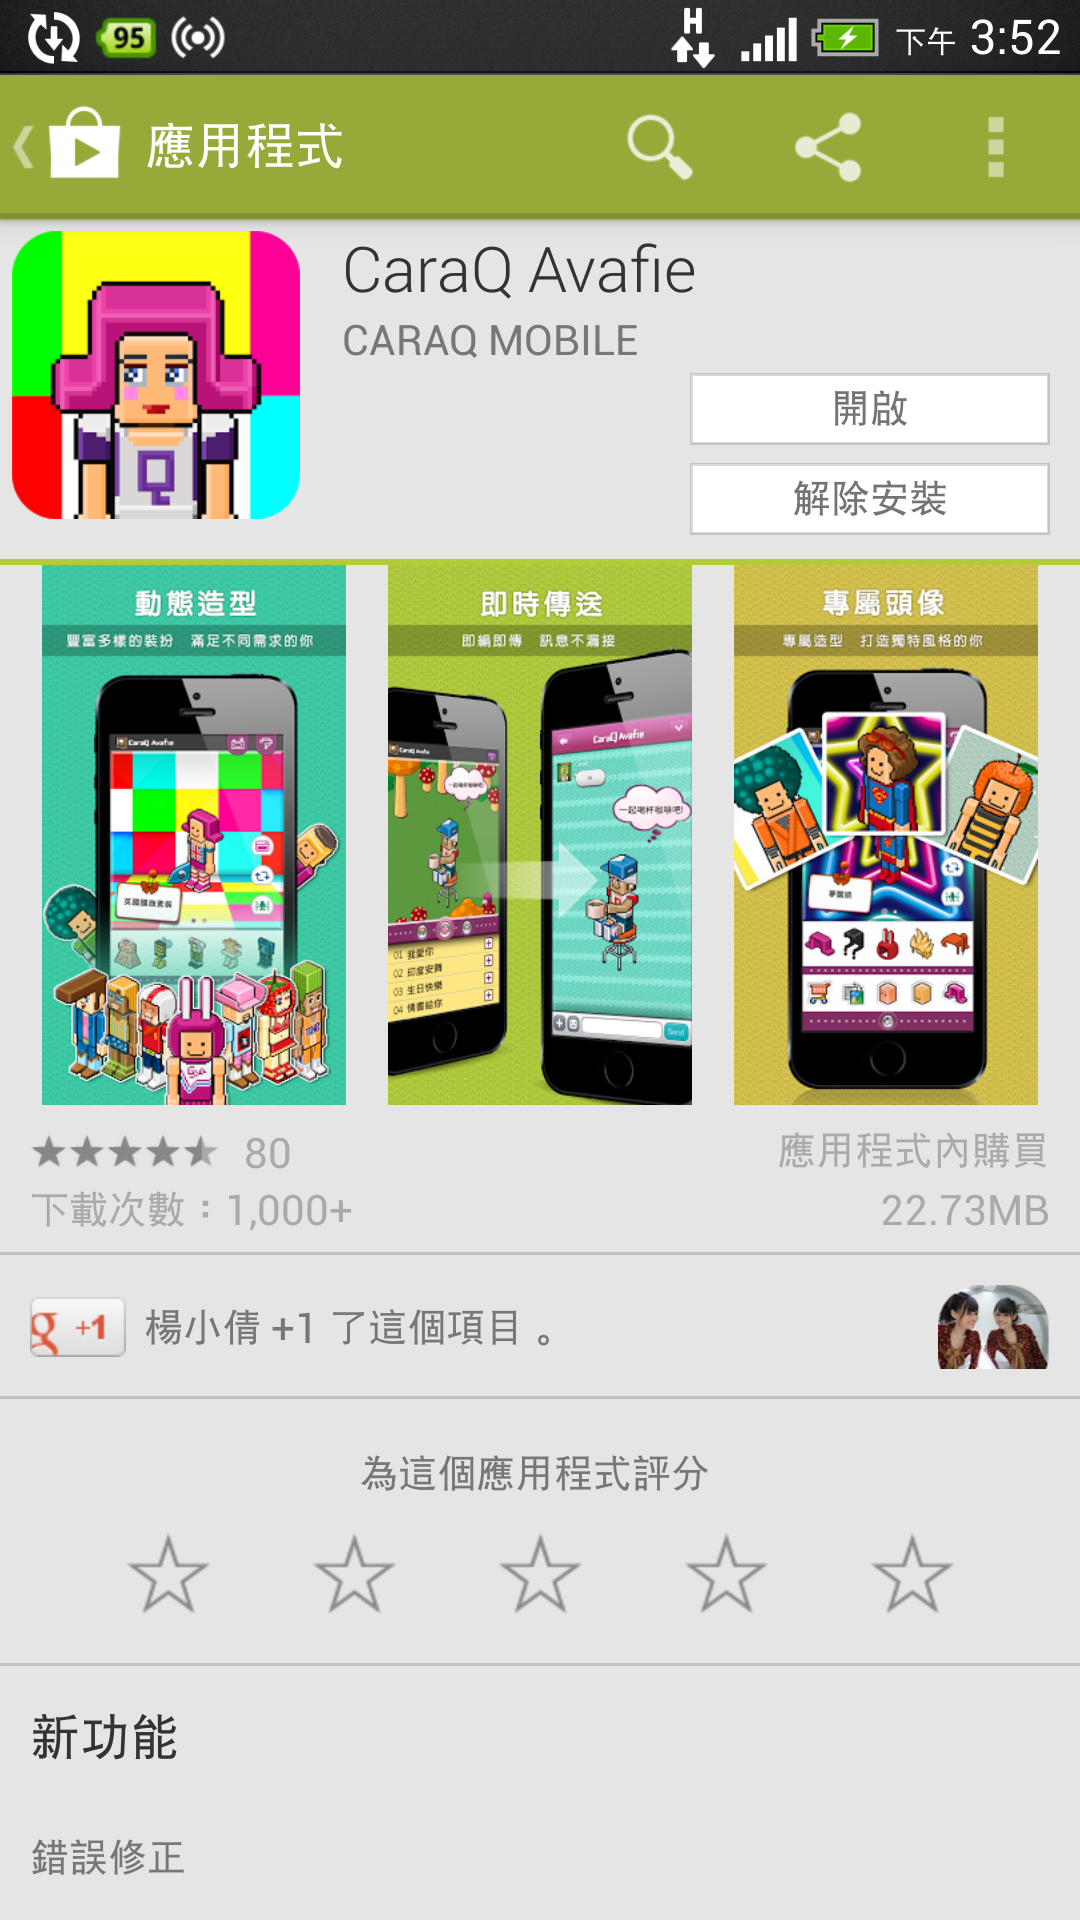 Screenshot_2014-01-08-15-52-30.png